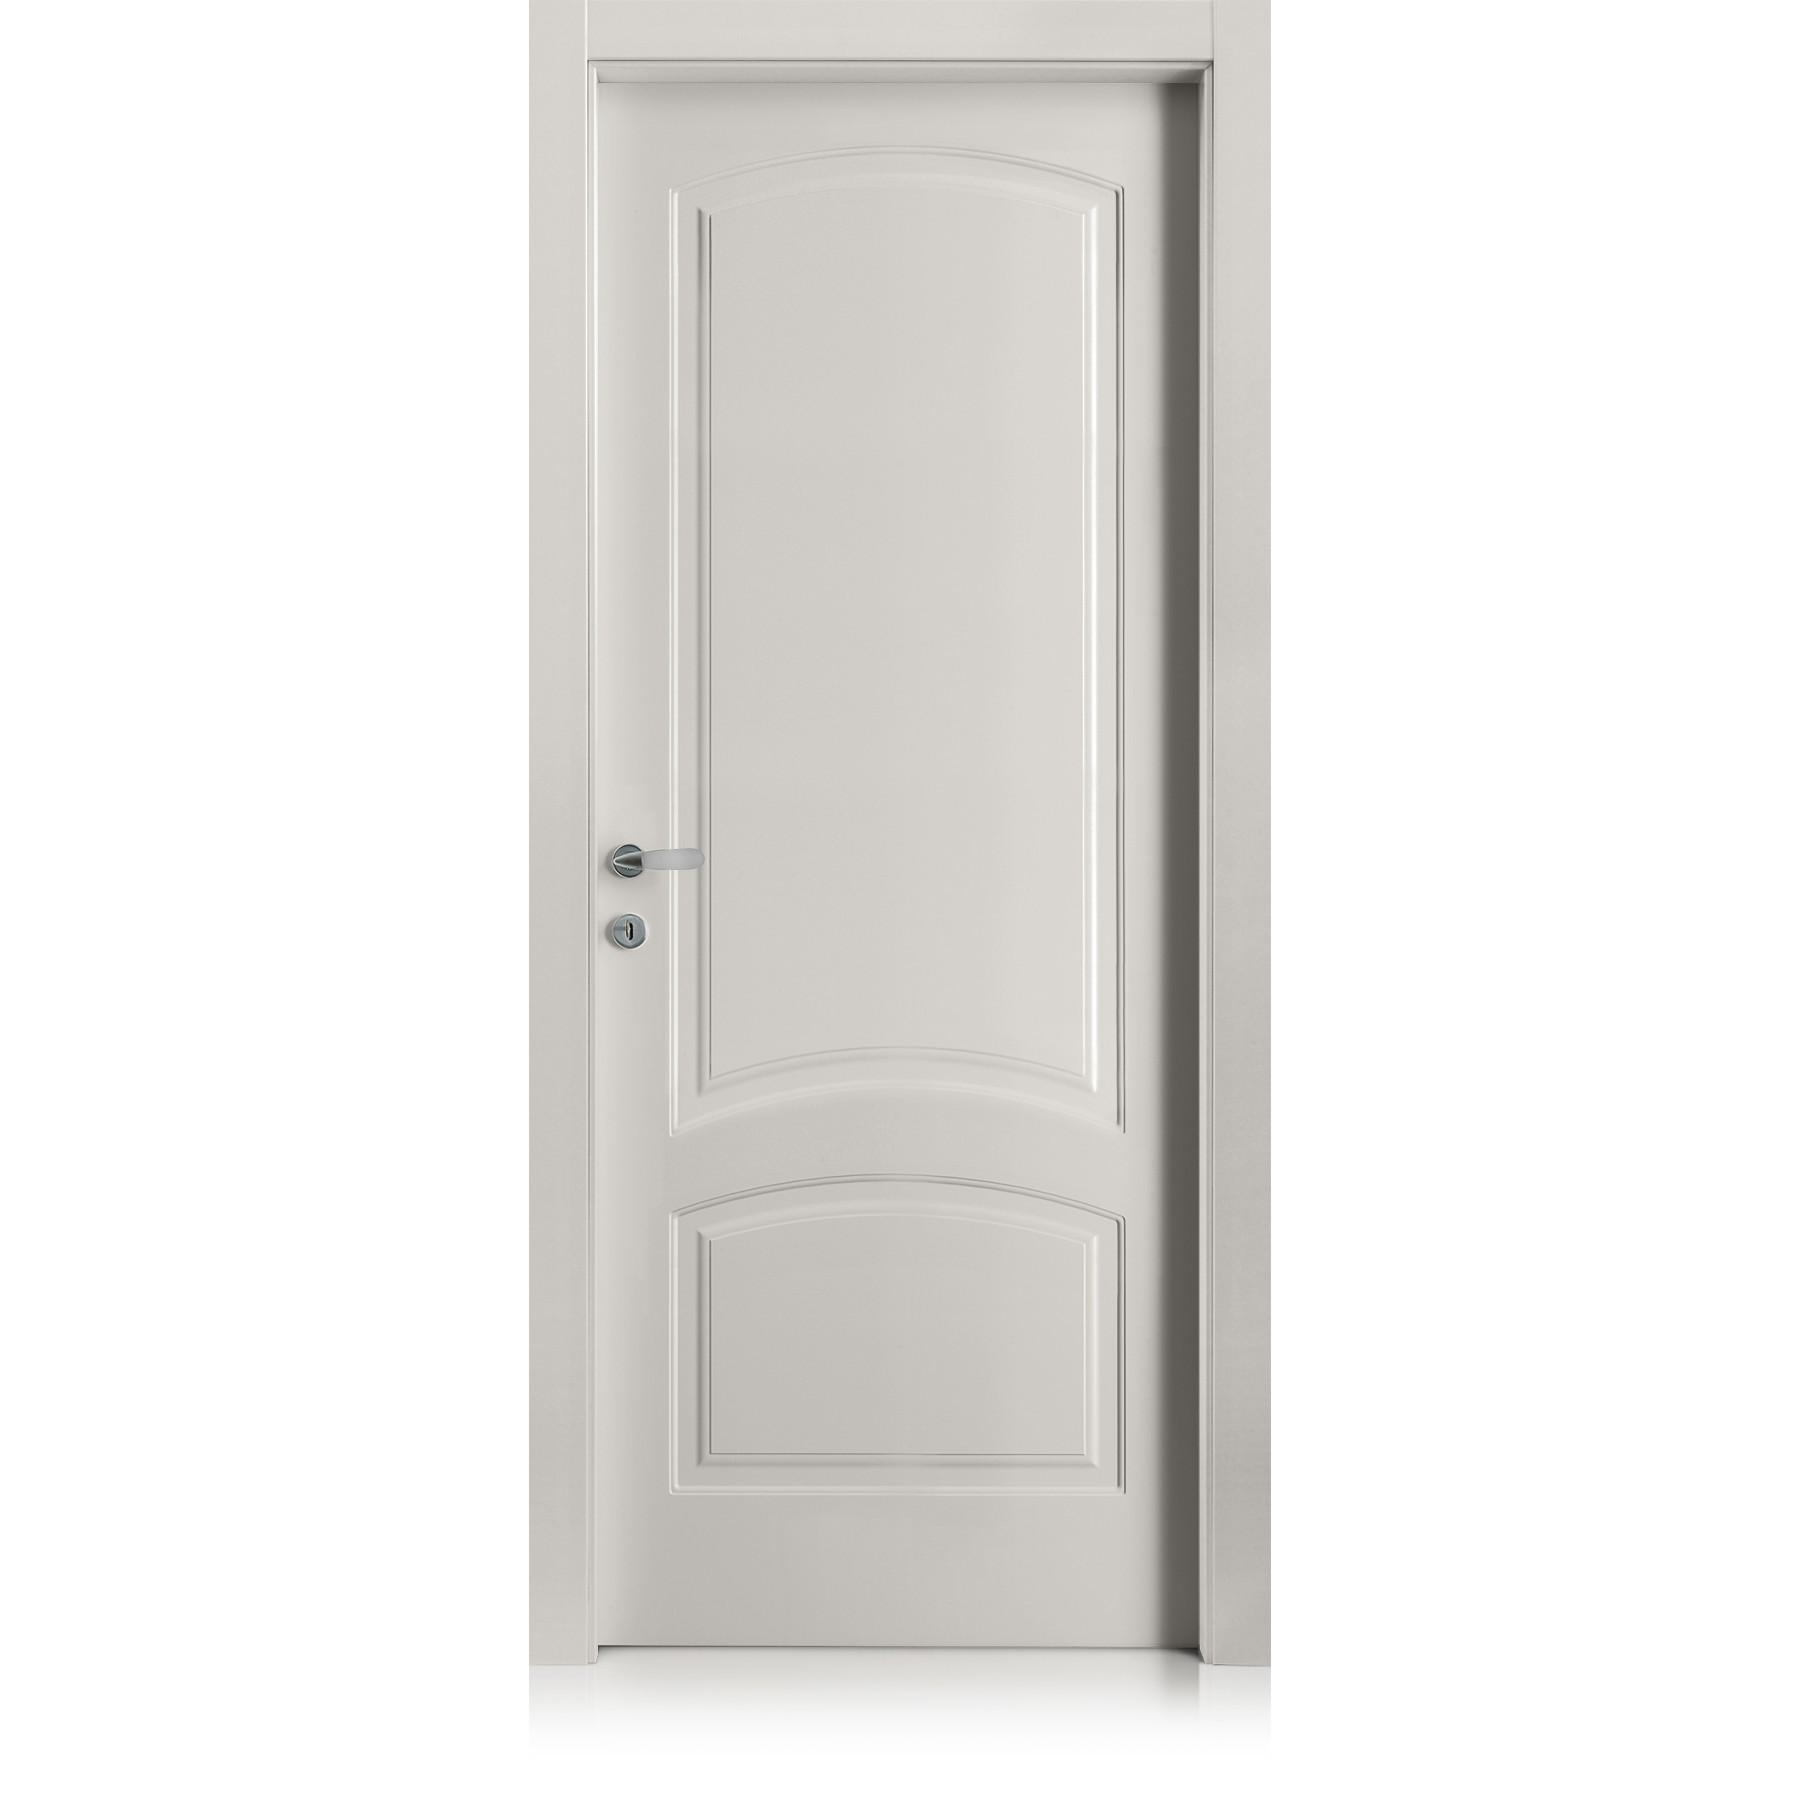 Tür Kevia / 5 grigio lux